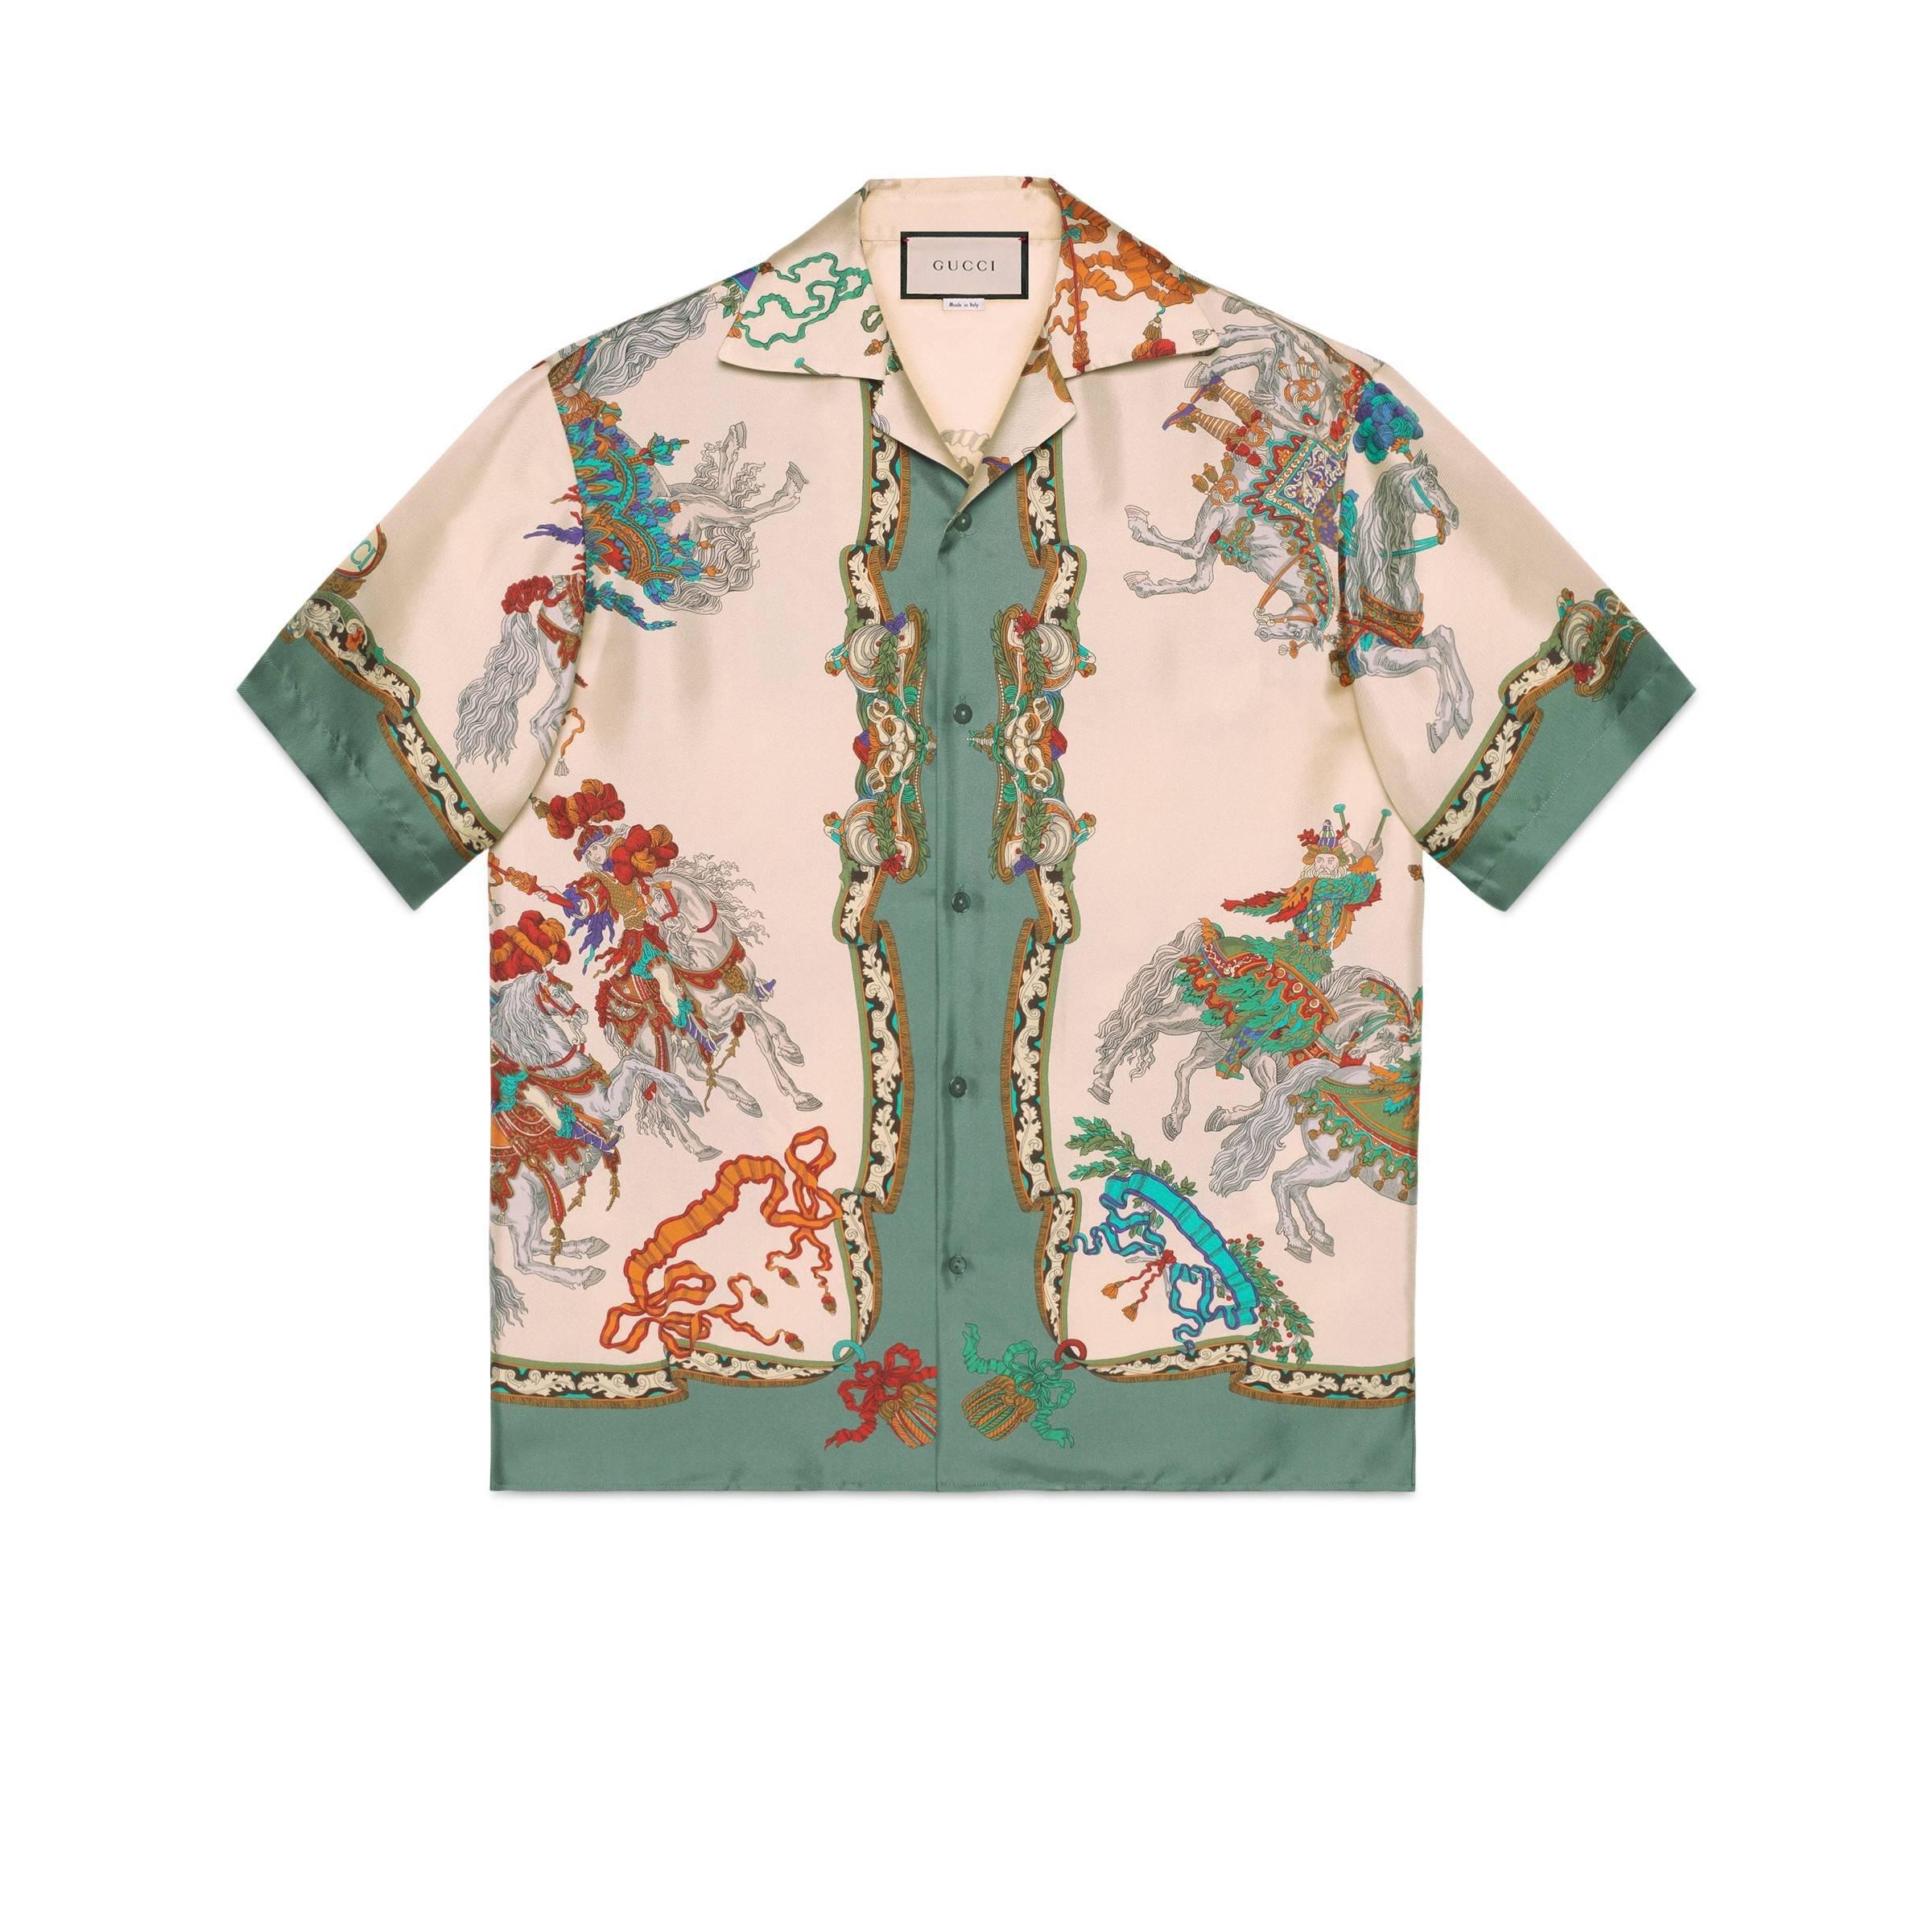 73cd5f09a Gucci - White Graphic-print Oversized Silk Shirt for Men - Lyst. View  fullscreen